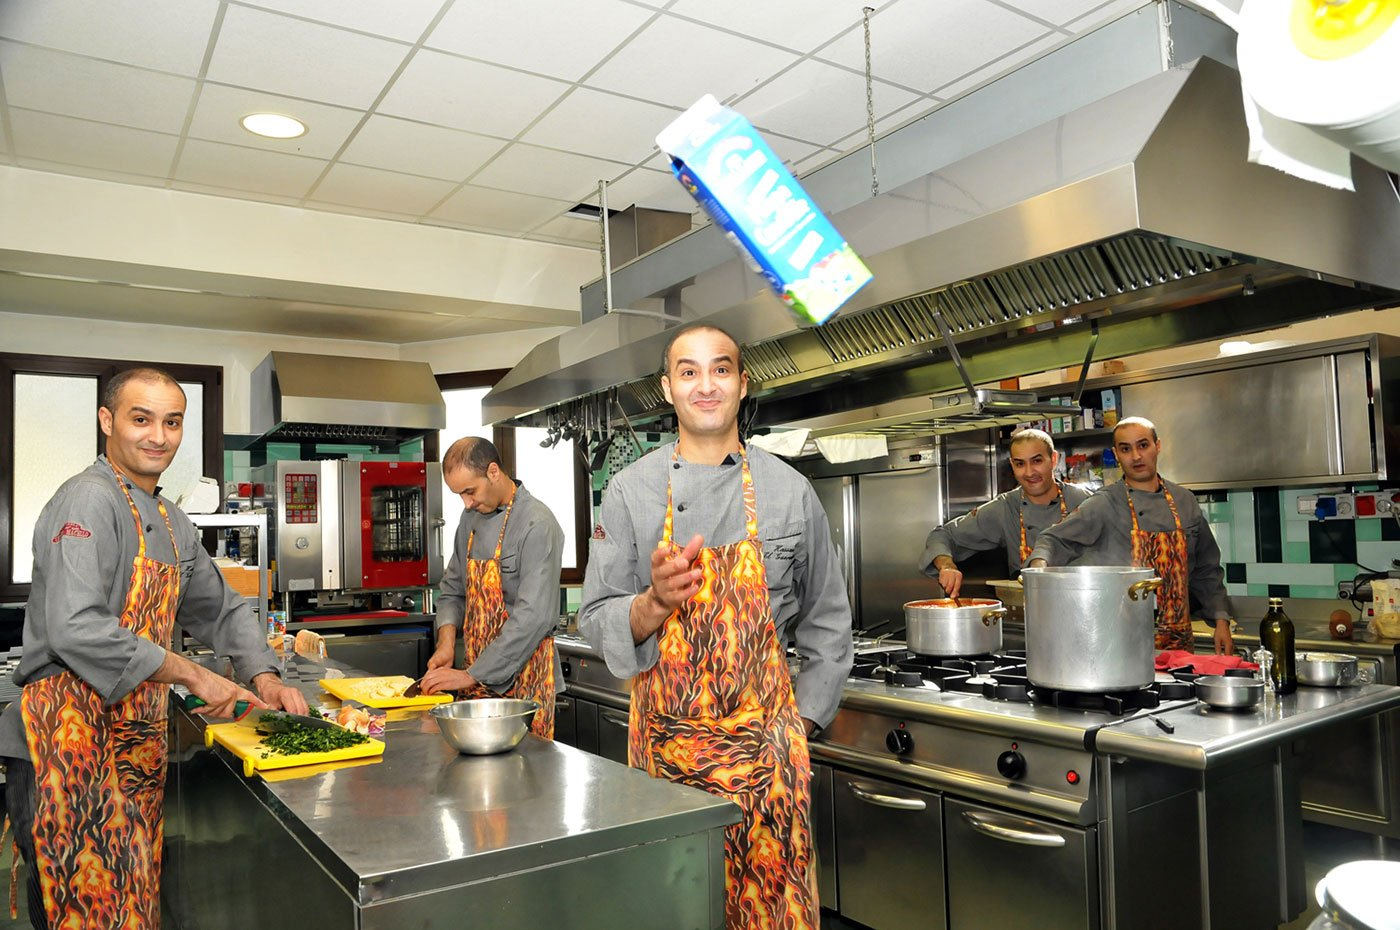 Un'immagine raffigurante un cuoco in azione in una cucina